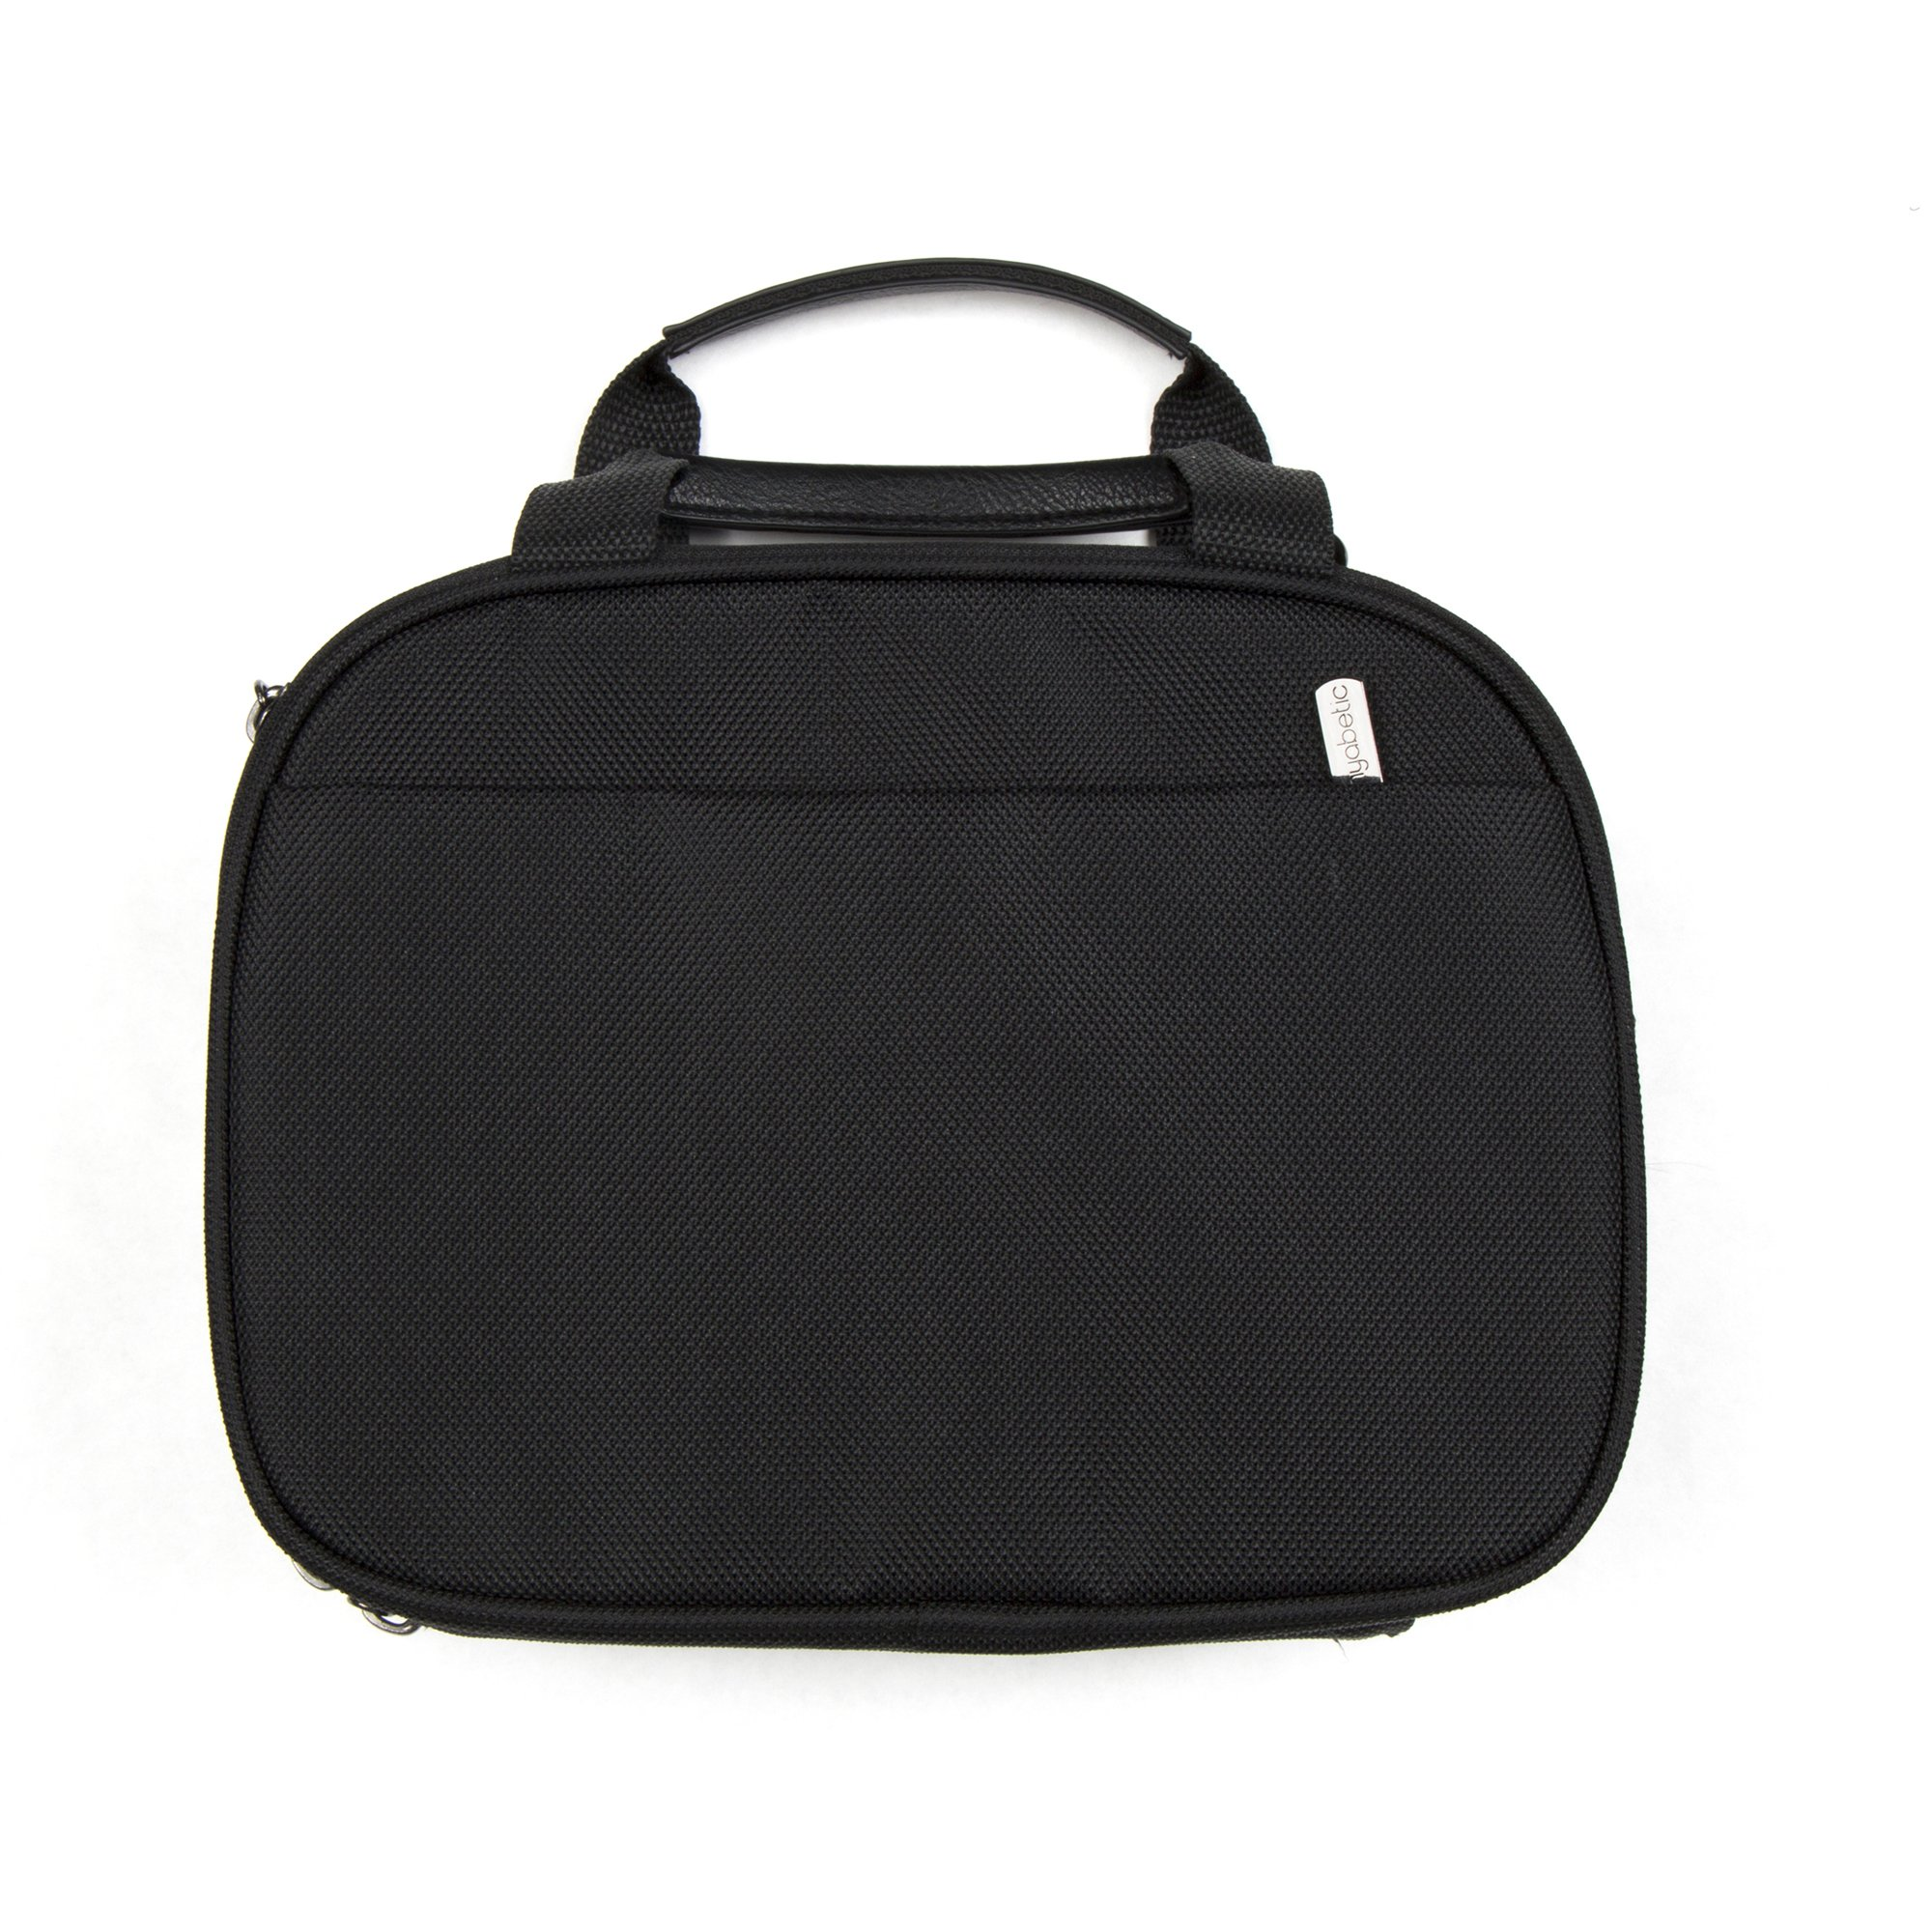 t:pack Case